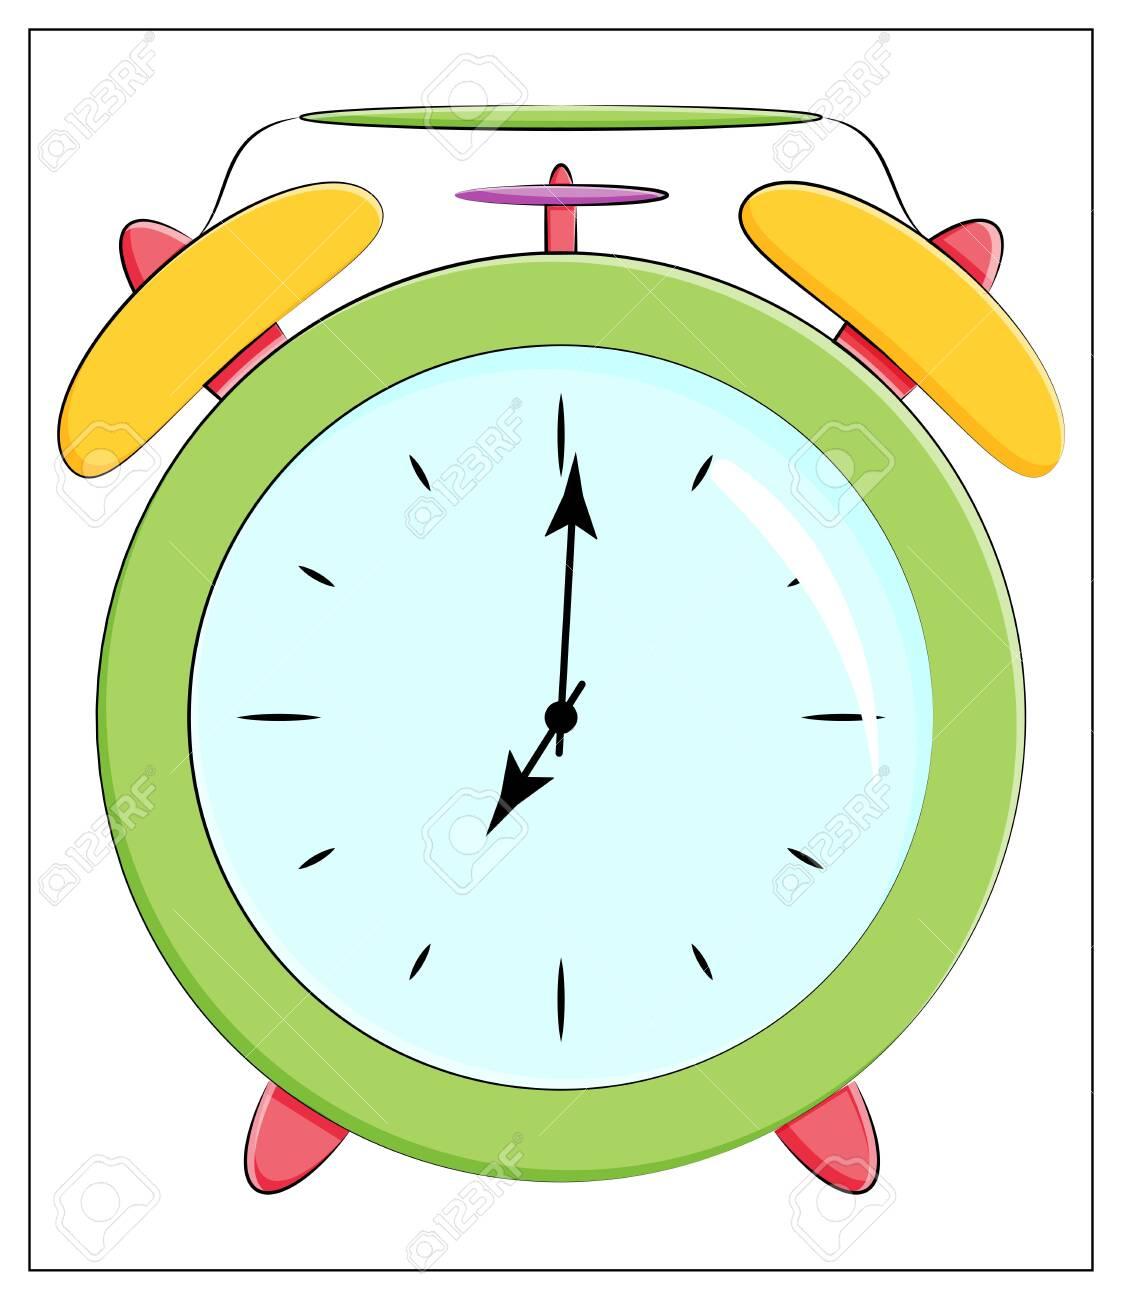 Vector Silhouette of classic clock Icon. Flat vector illustration of green Alarm clock - 151558109